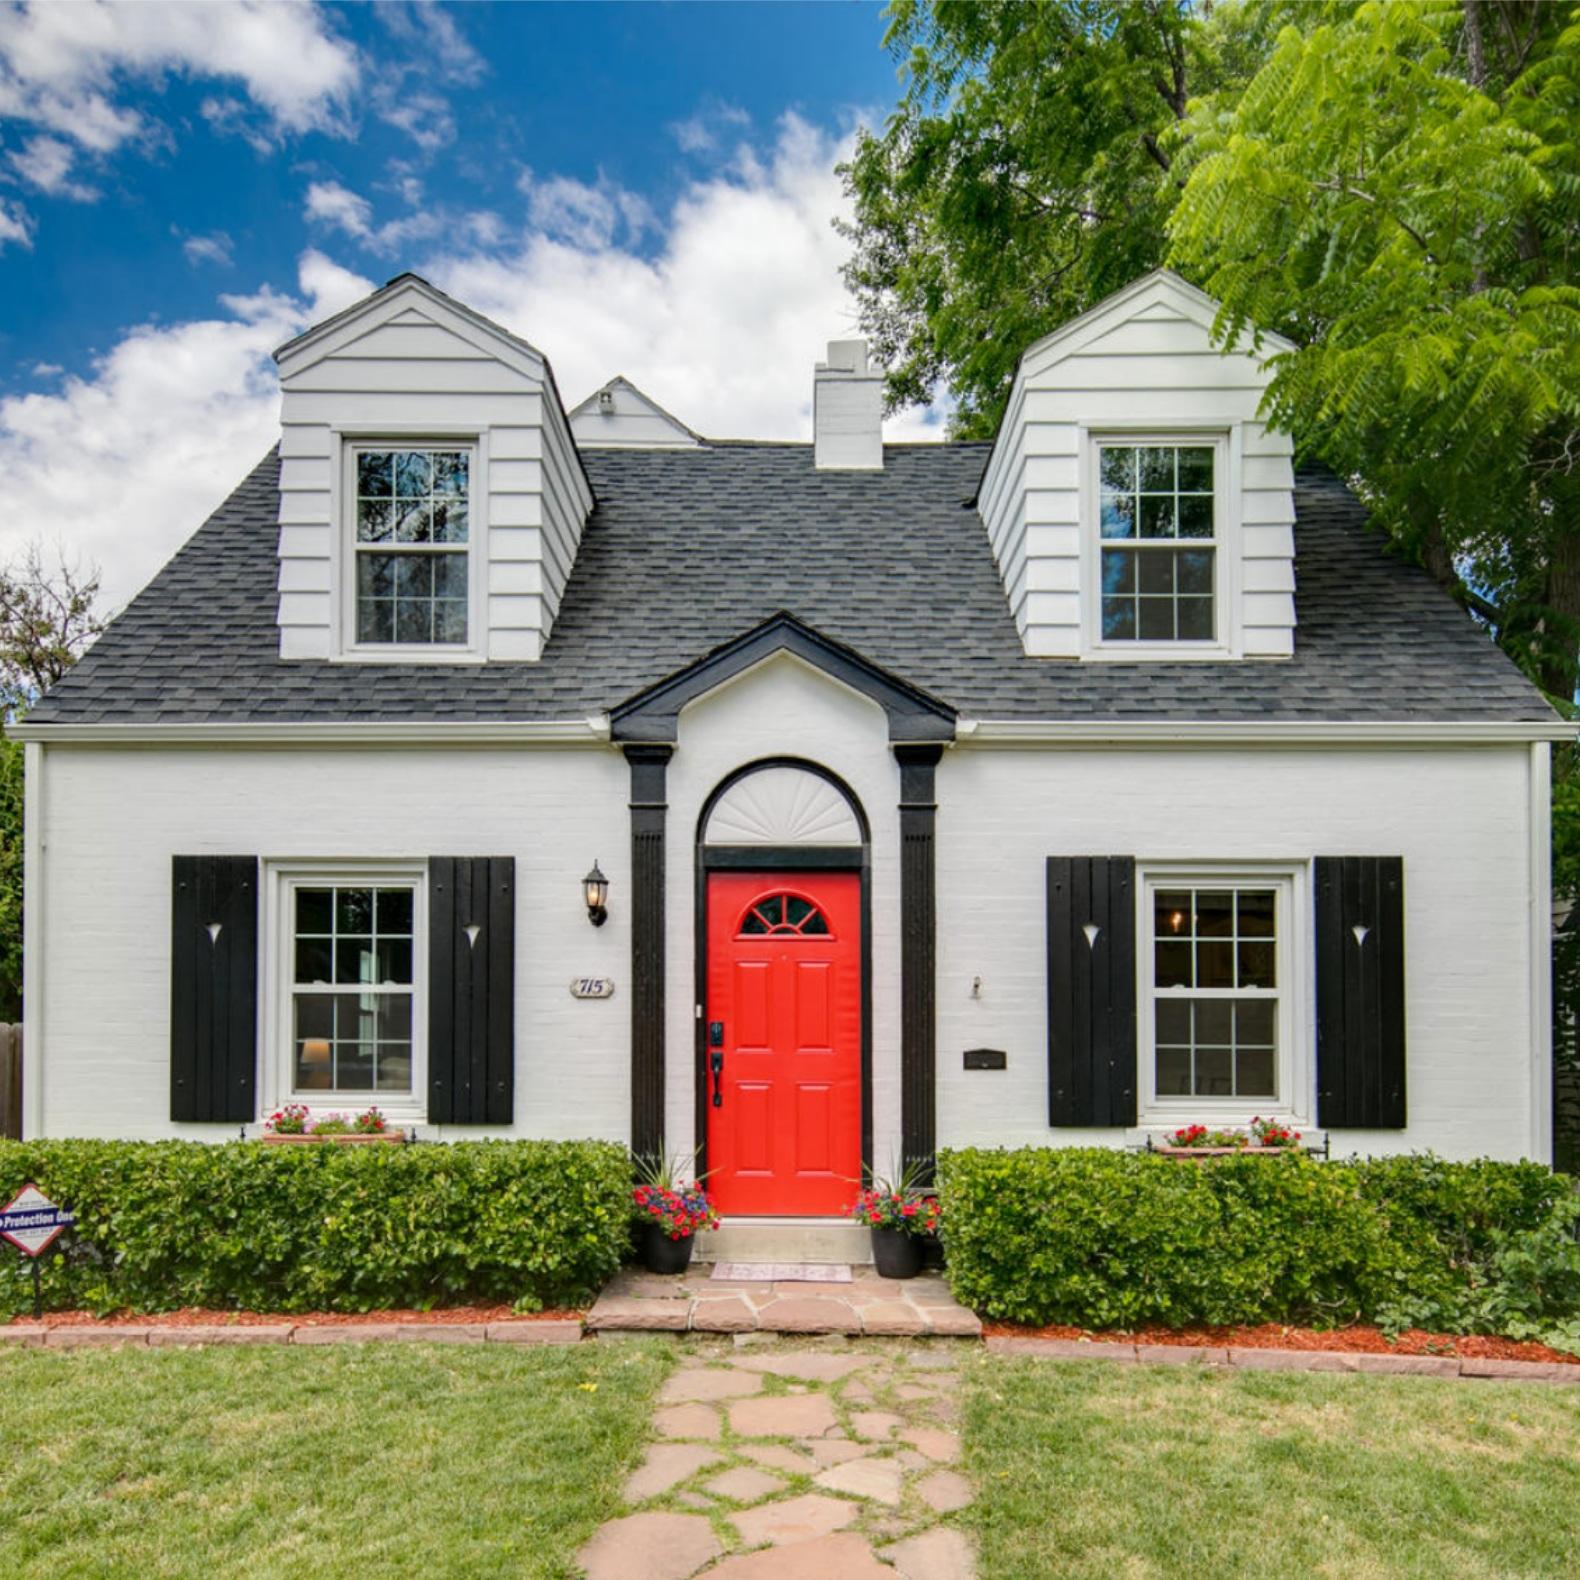 mayfair-montclair-real-estate.jpg